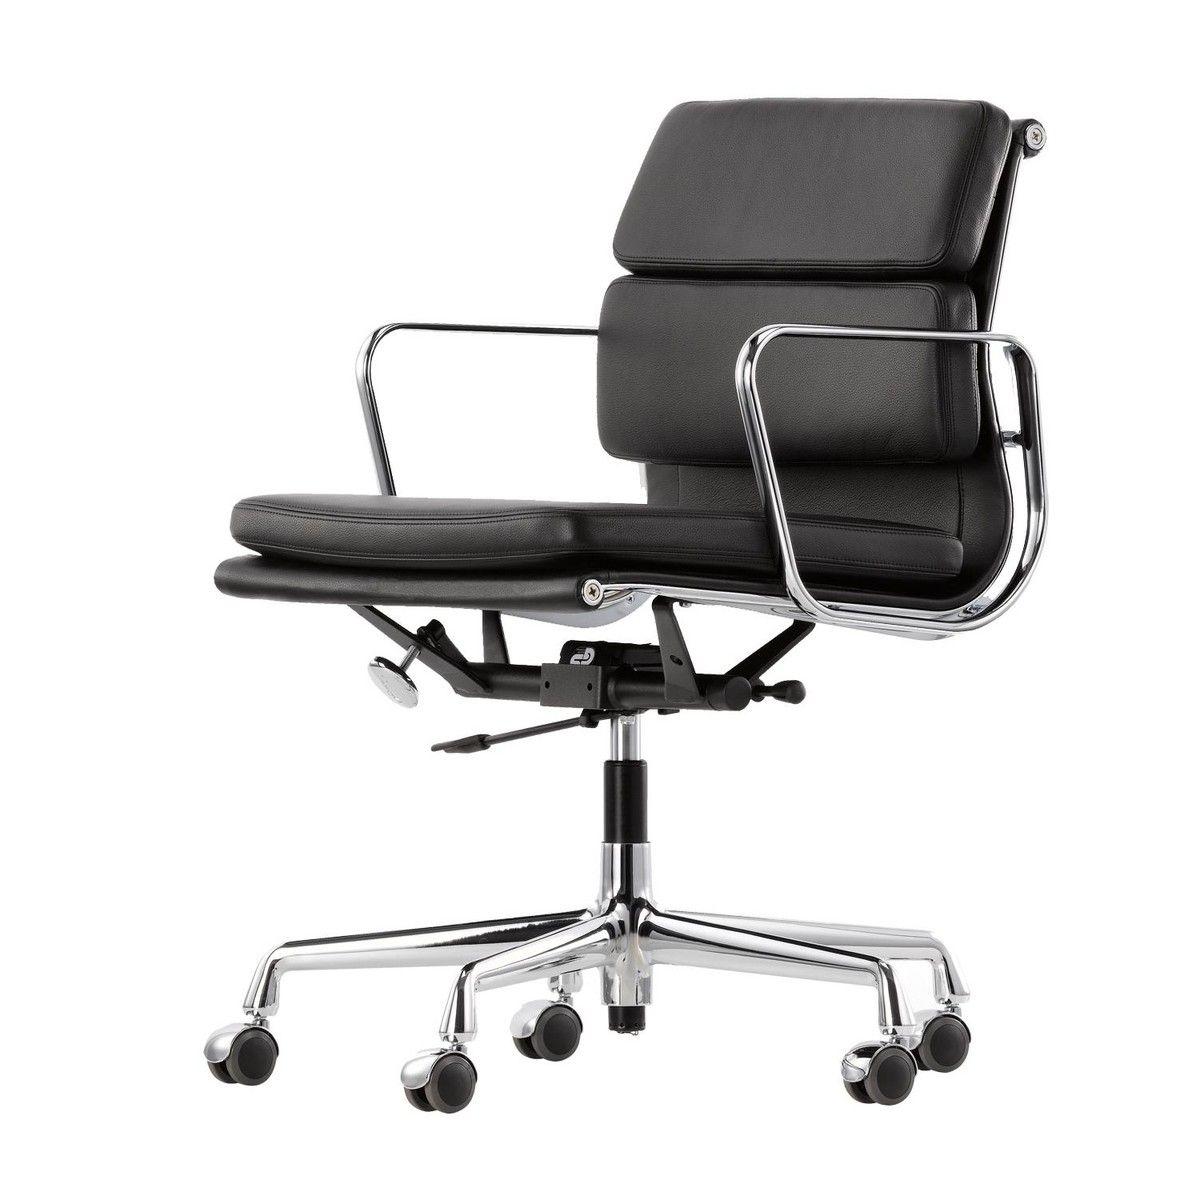 Bürostuhl eames  Vitra - EA 217 Soft Pad Eames Alu Chair Bürostuhl - Leder nero ...